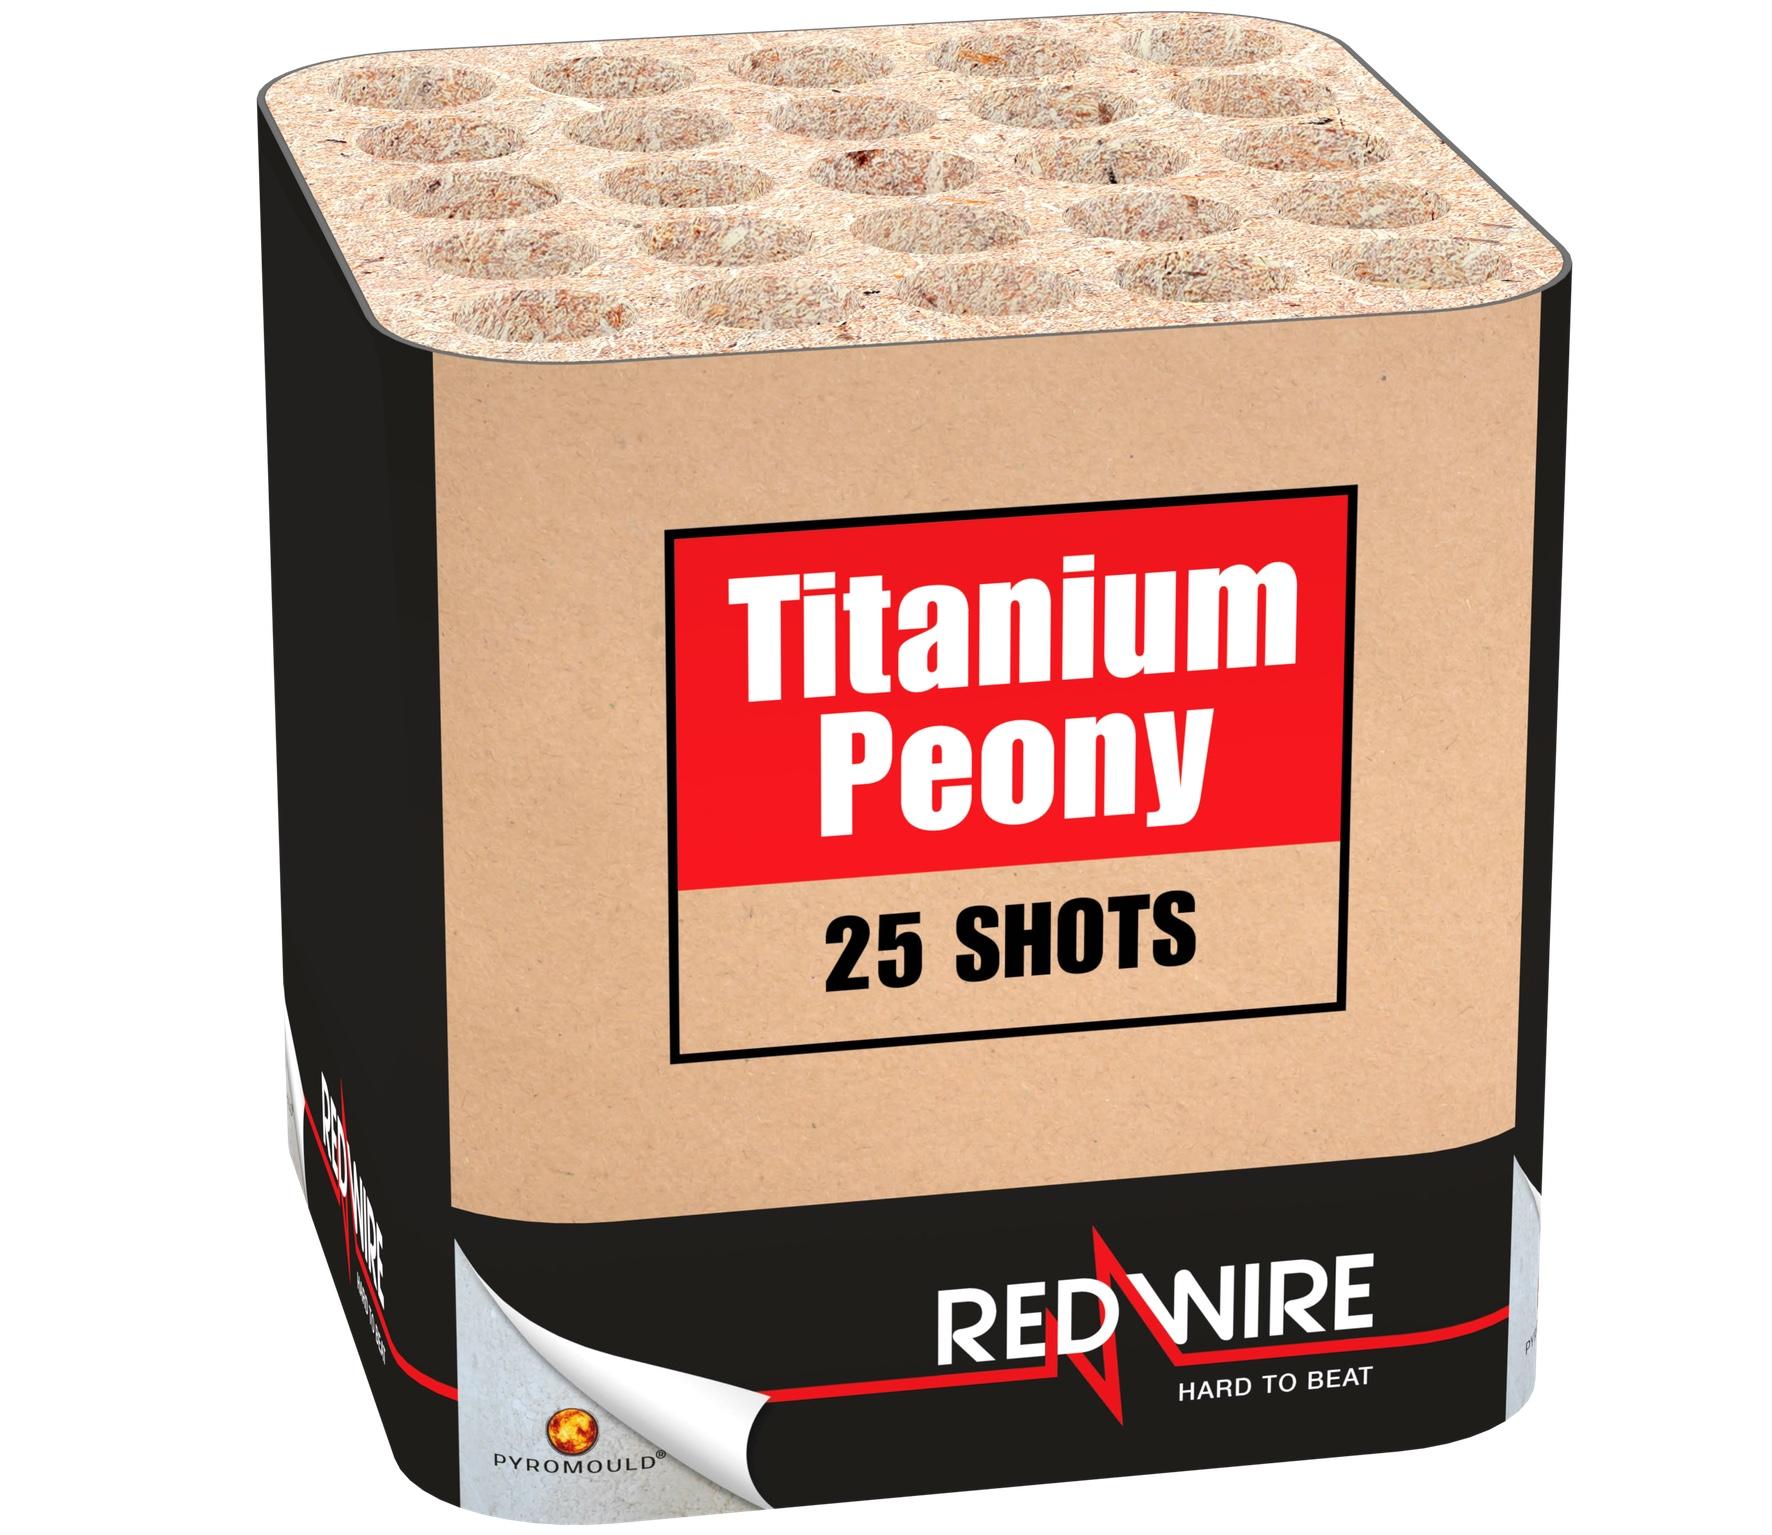 Titanium Peony 25 schots